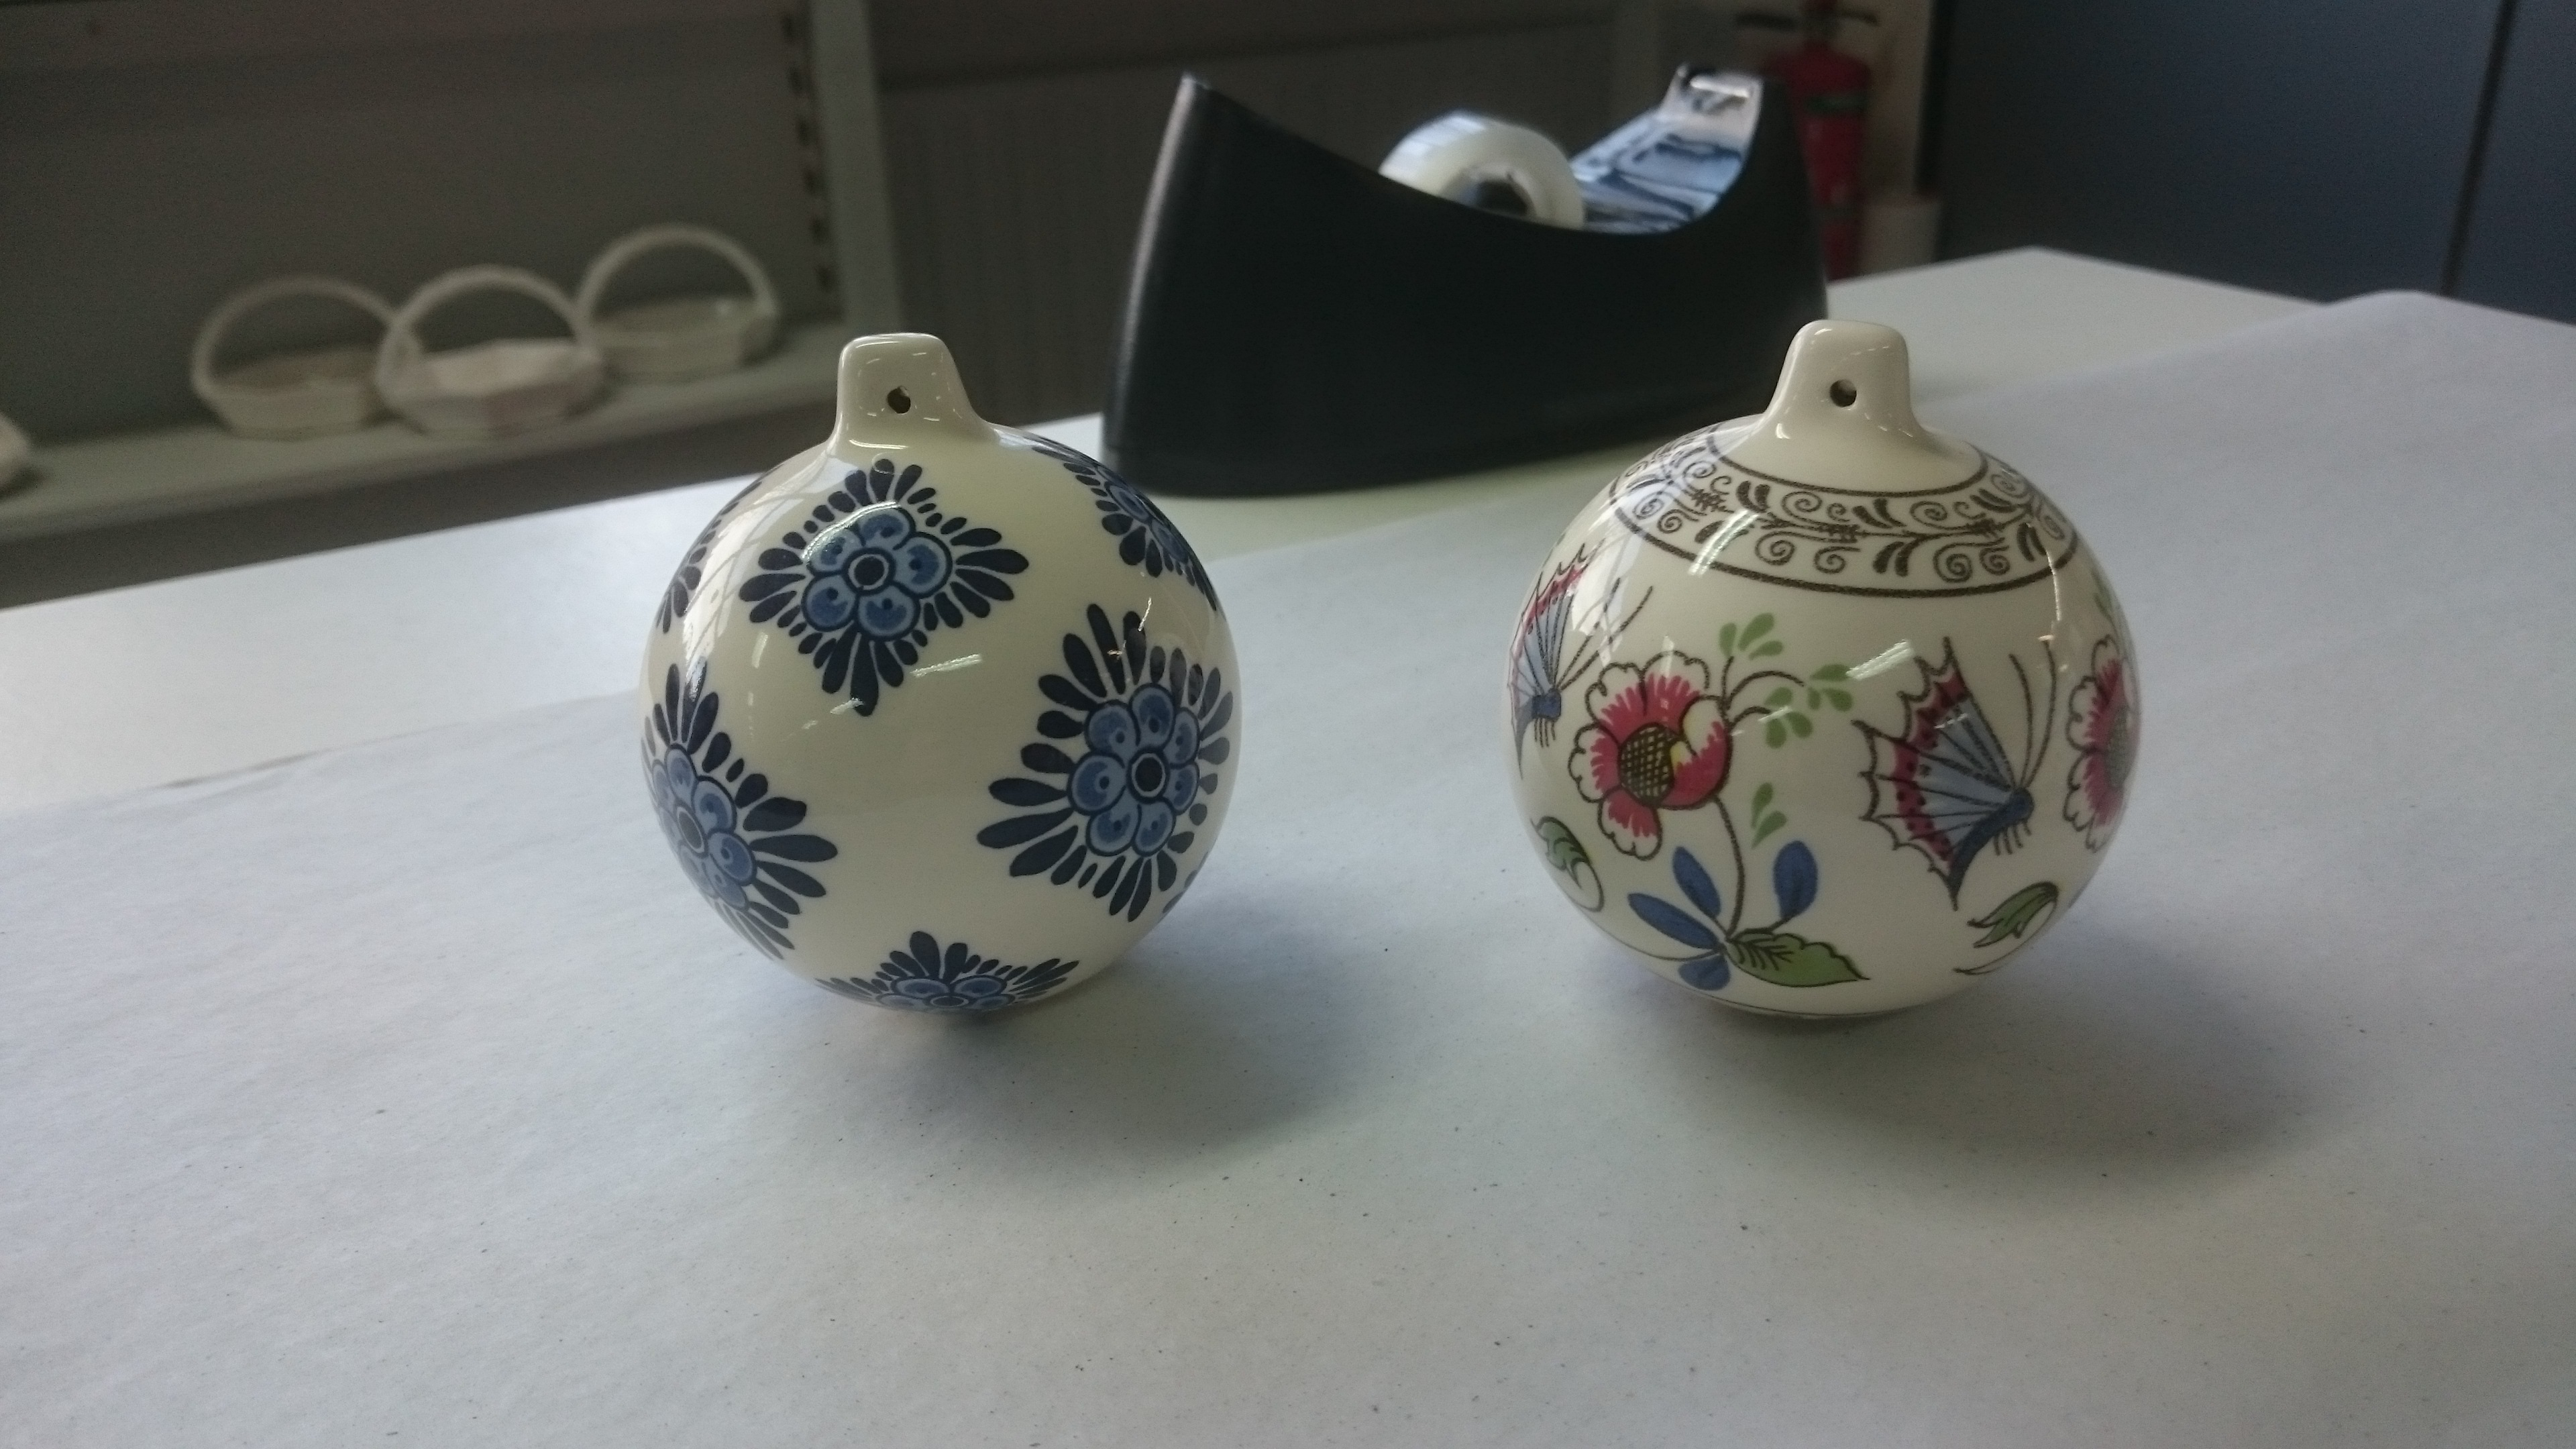 kerstbal, keramiek, bloemen, vlinder